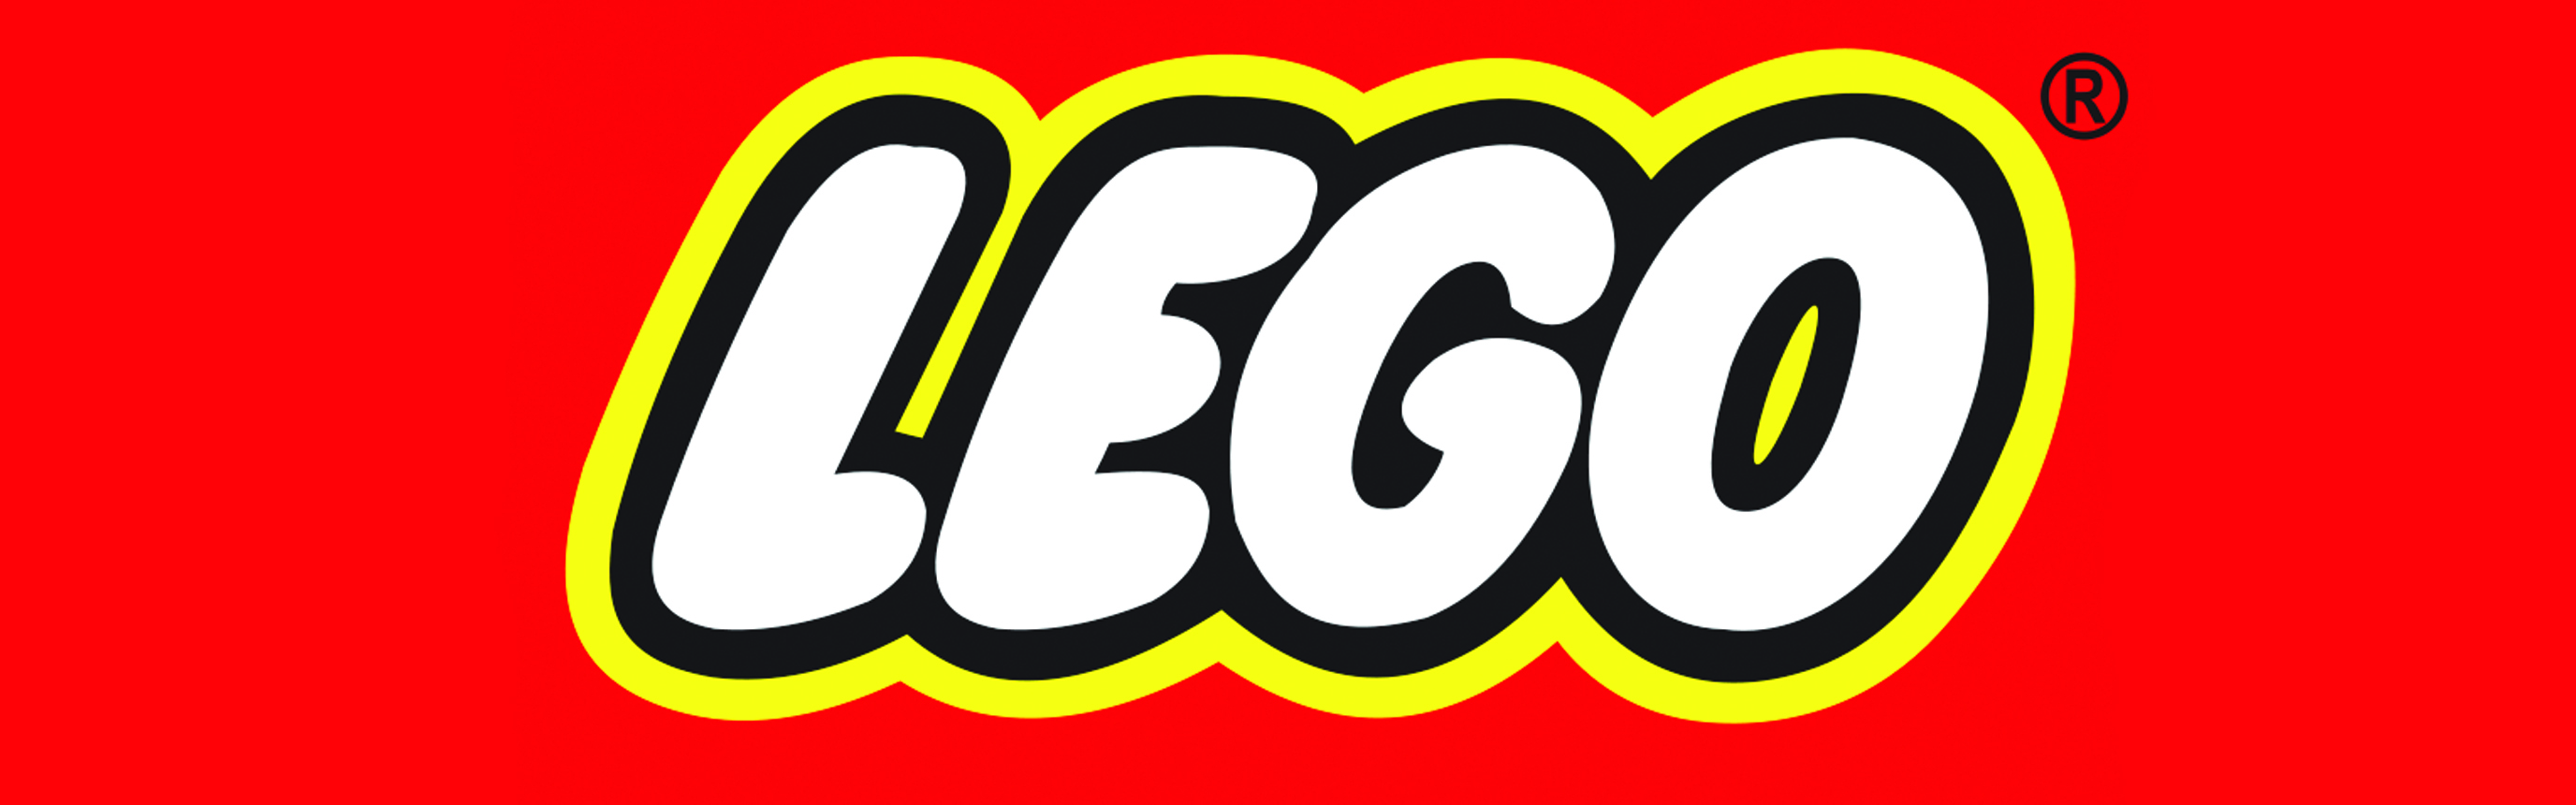 Lego logo clip art clipart transparent stock Lego Logo Clip Art - ClipArt Best clipart transparent stock